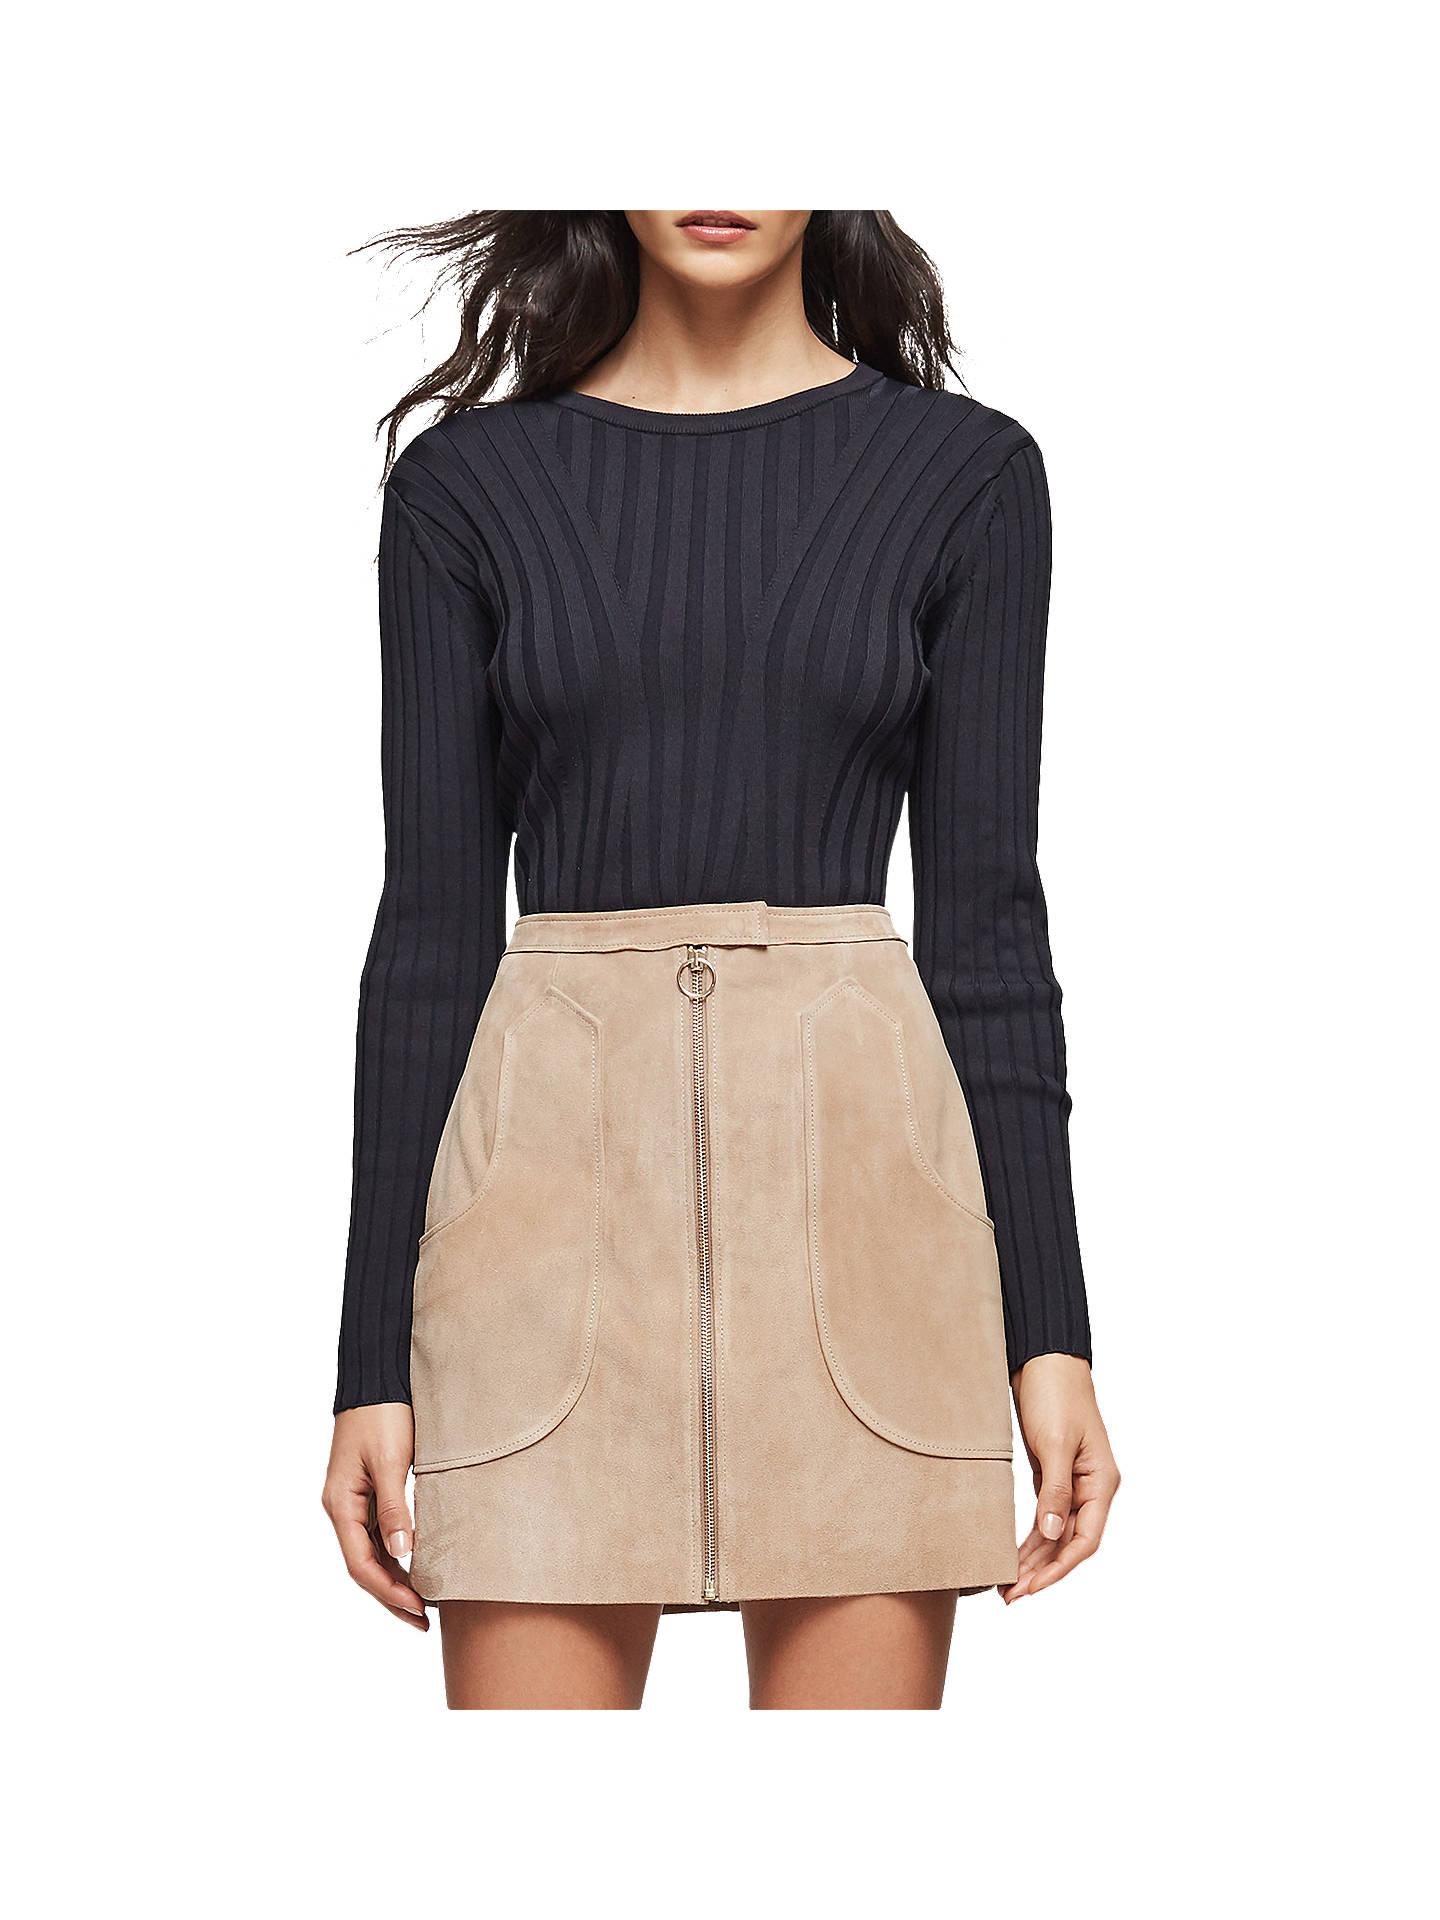 cbd385cc82 Buy Reiss Keaton Suede Mini Skirt, Sand, 6 Online at johnlewis.com ...